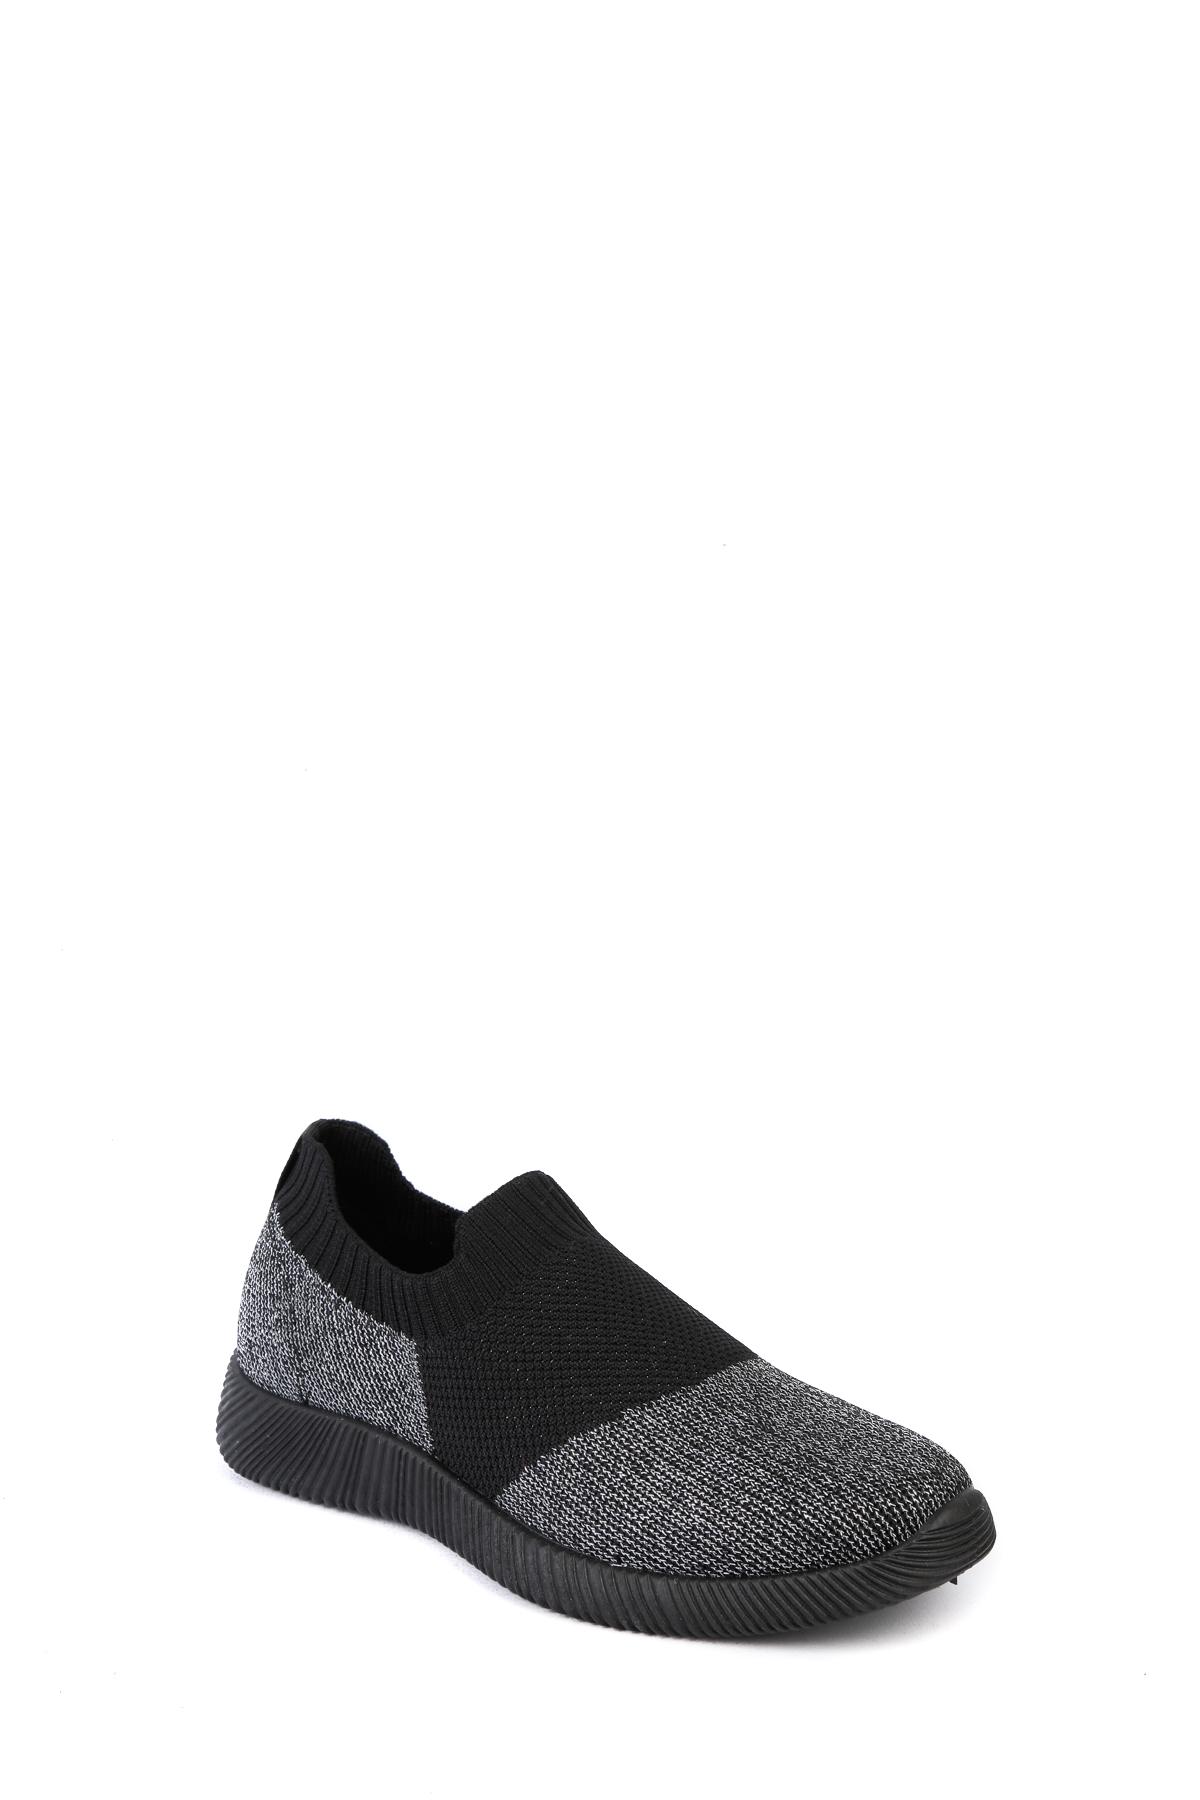 Baskets Chaussures Noir Creamberry' s Y329 #c eFashion Paris